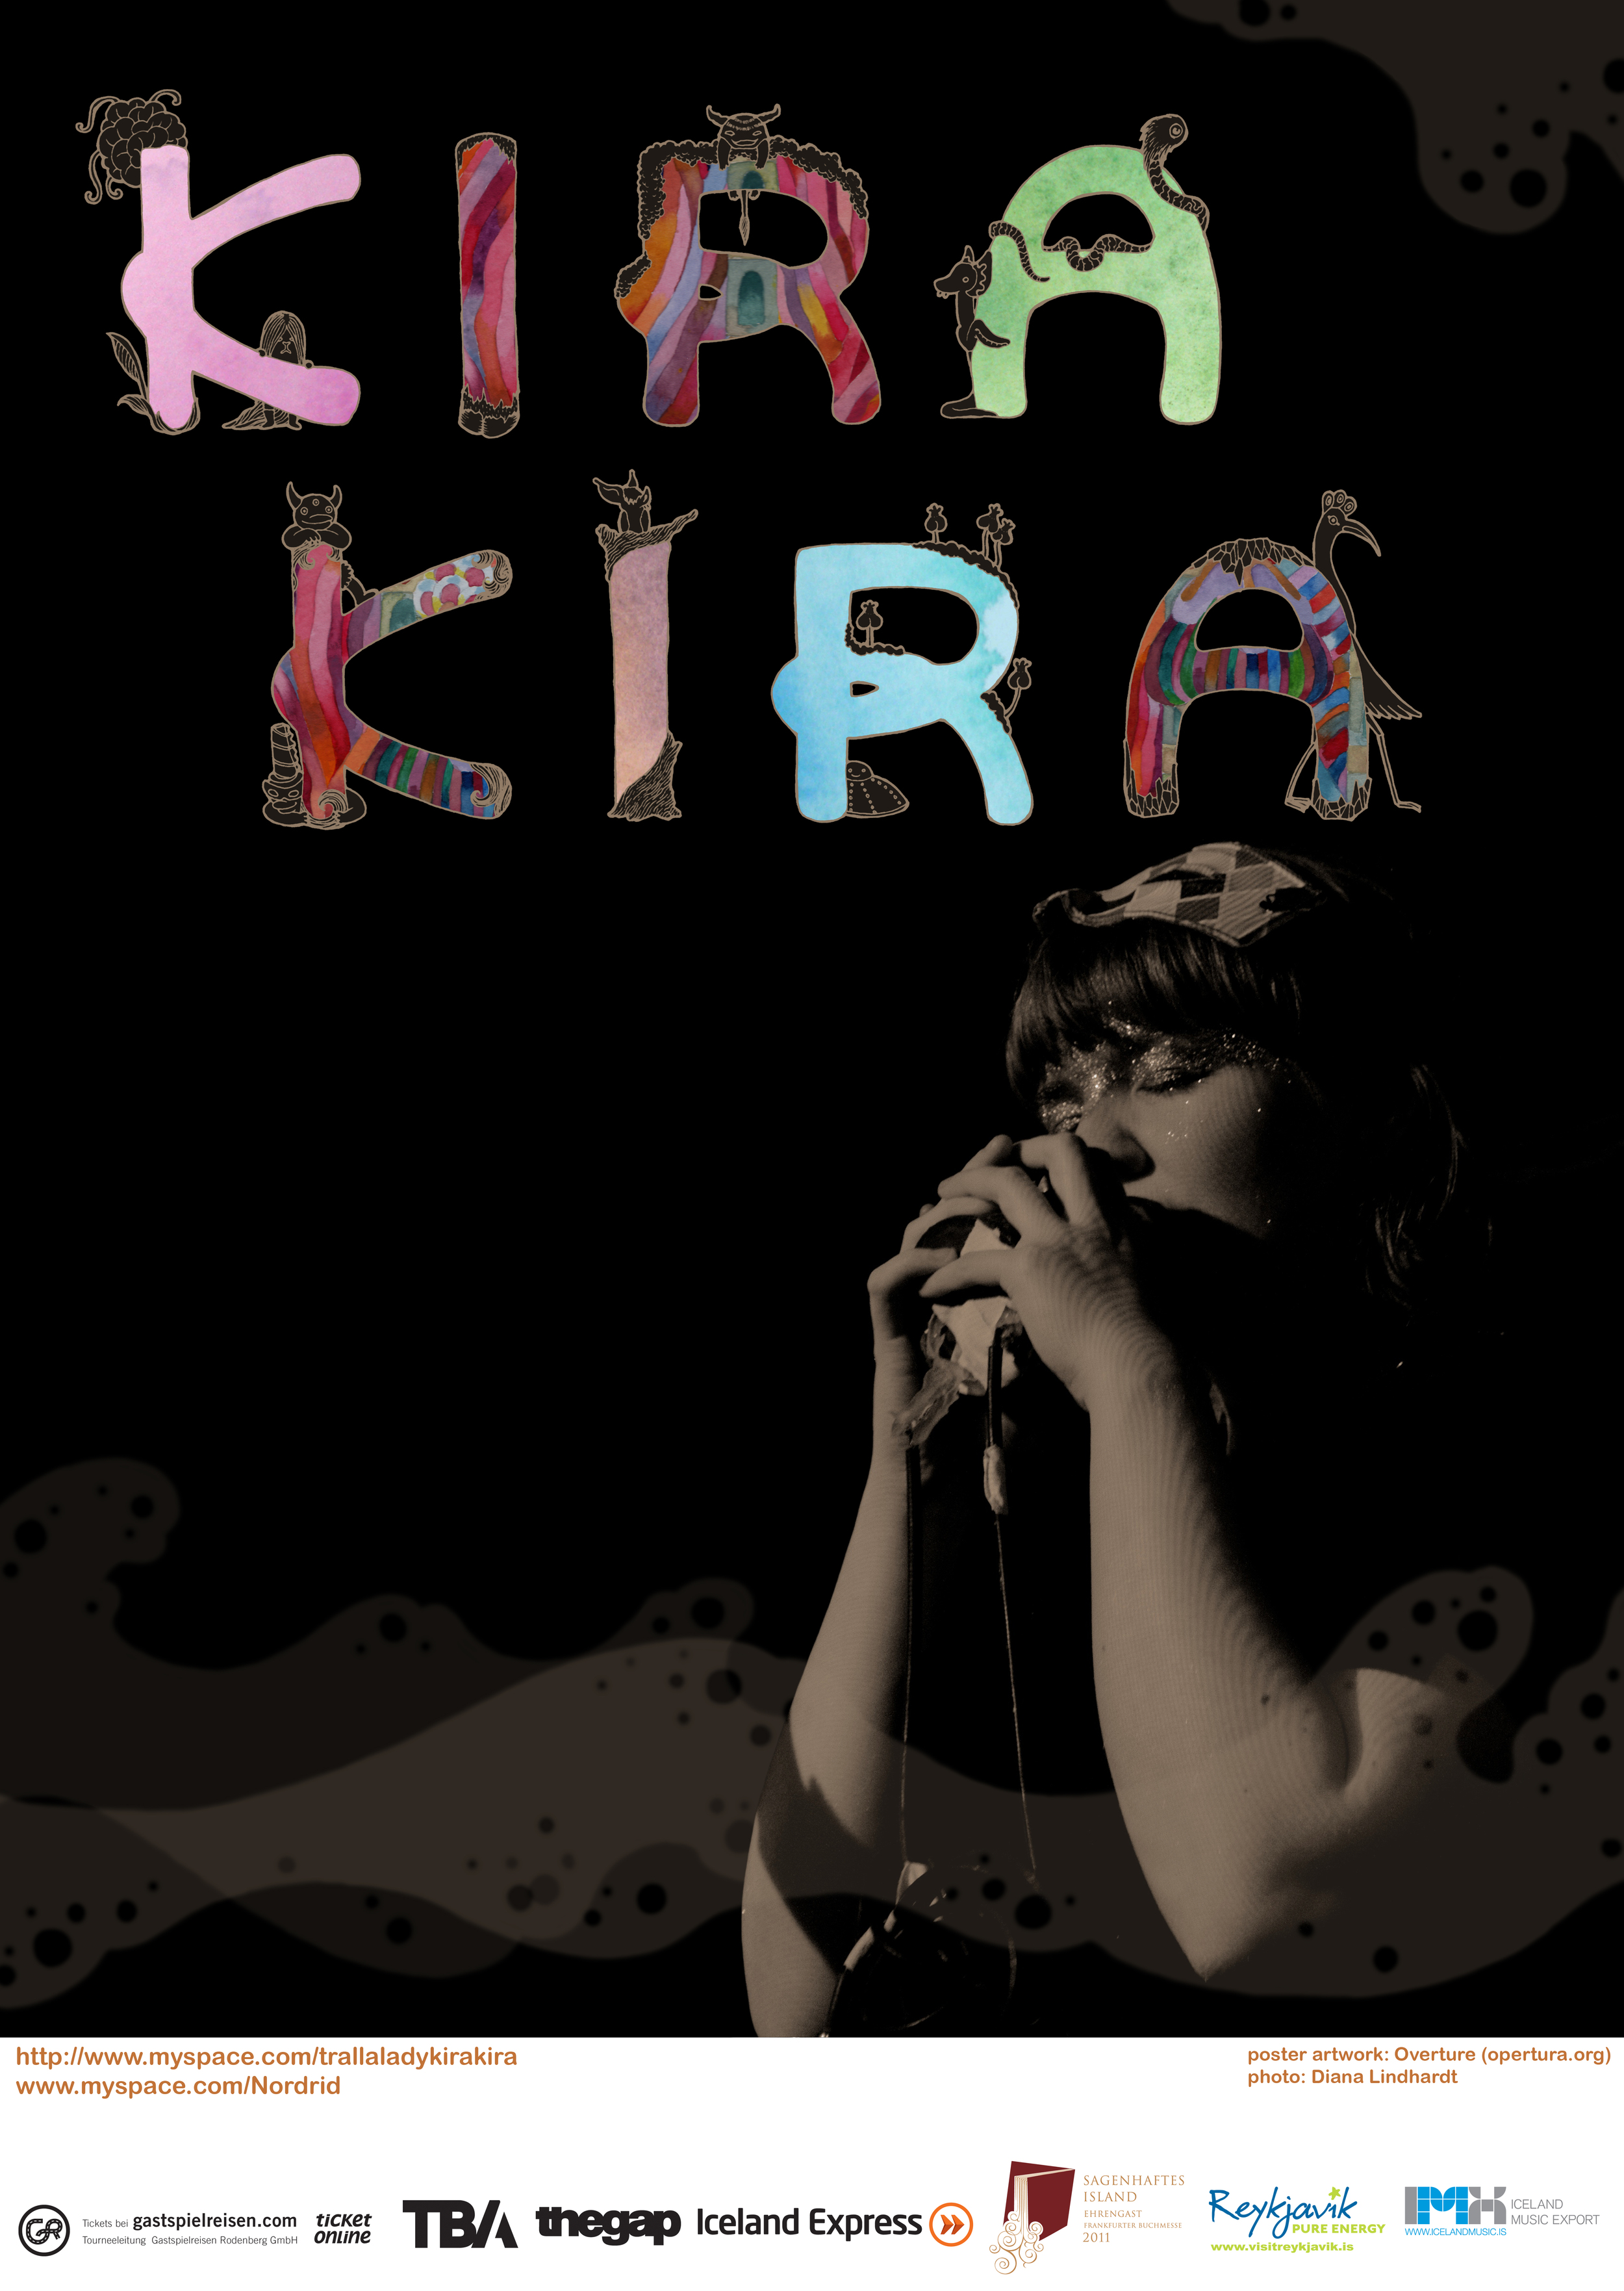 Kira Kira poster design